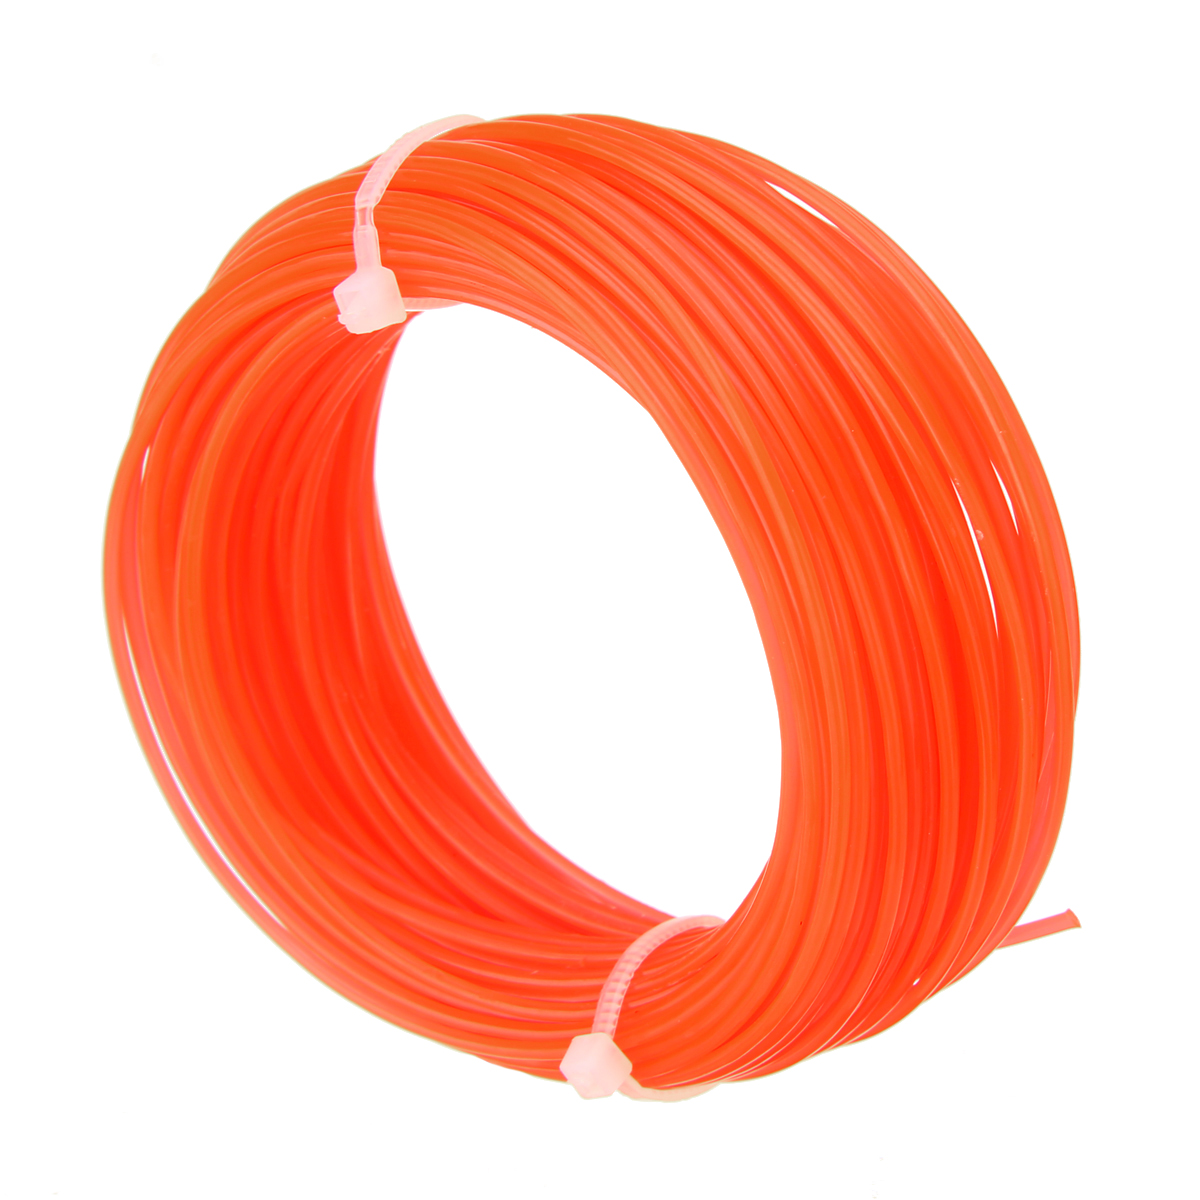 15mx1.25mm Grass Trimmer Line Strimmer Brushcutter Trimmer Nylon Rope Cord Line Roll